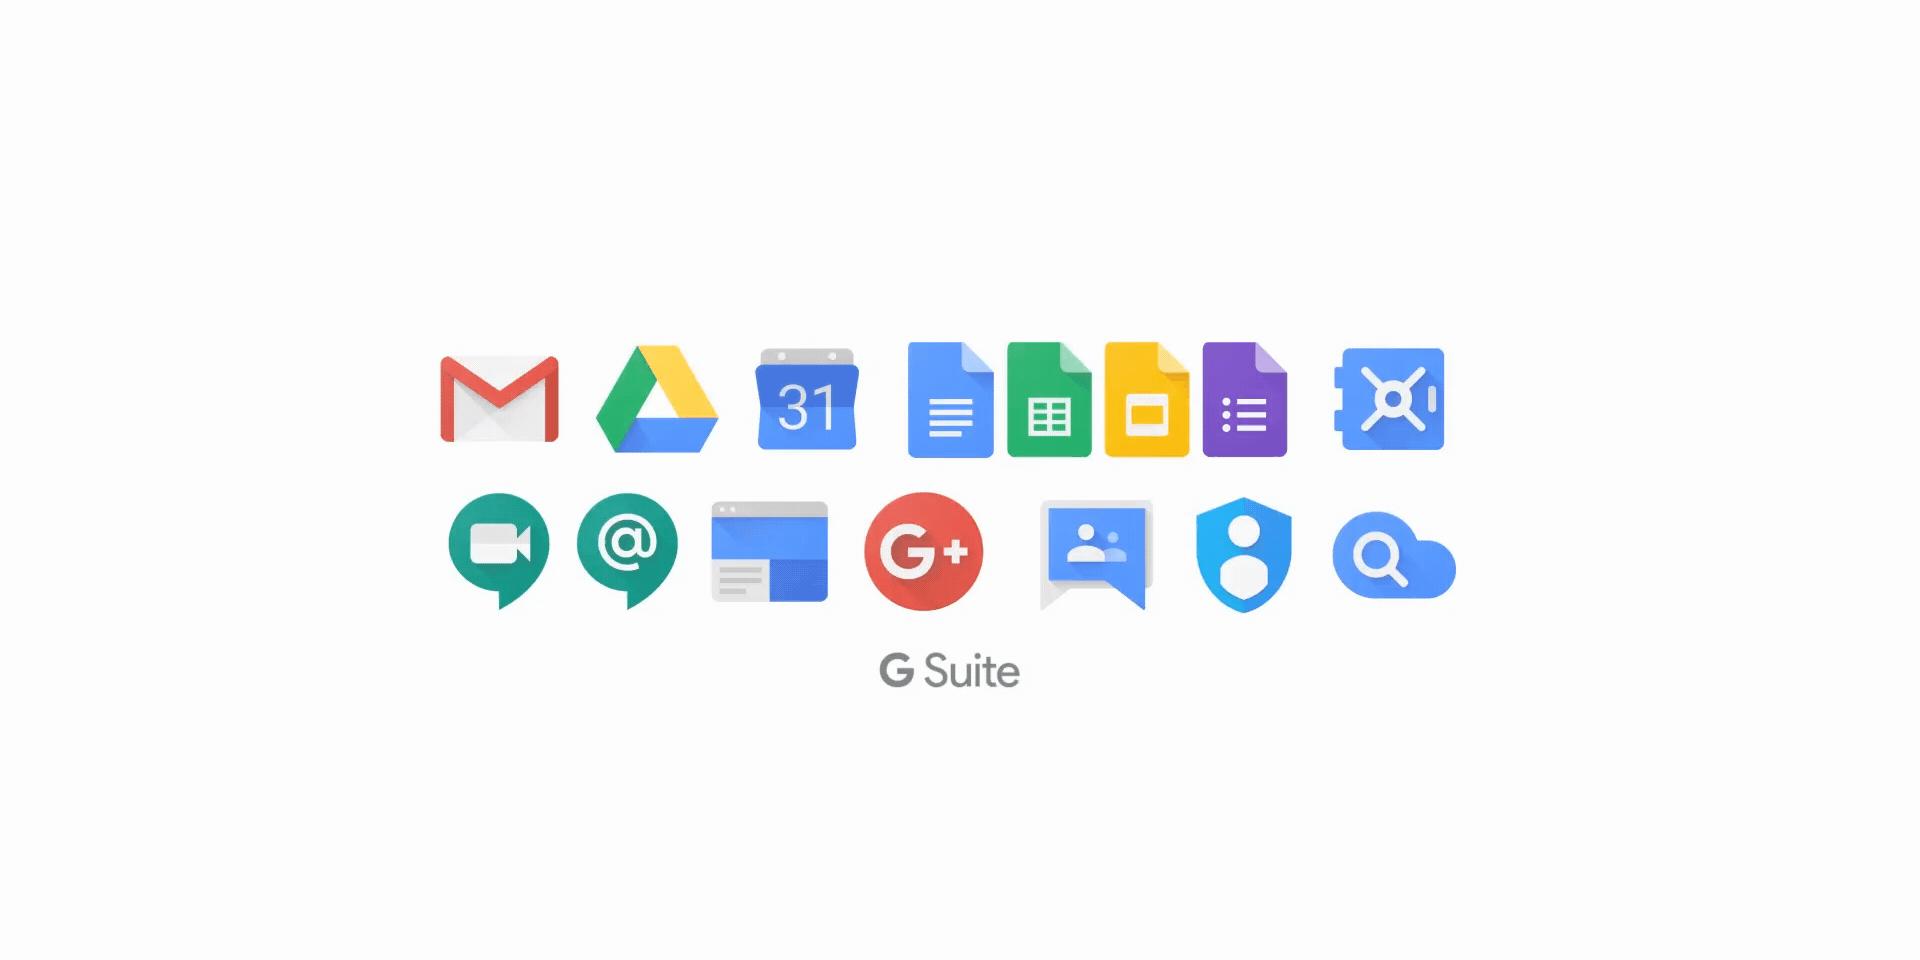 بدائل مايكروسوفت اوفيس- تطبيقات G Suite من Google